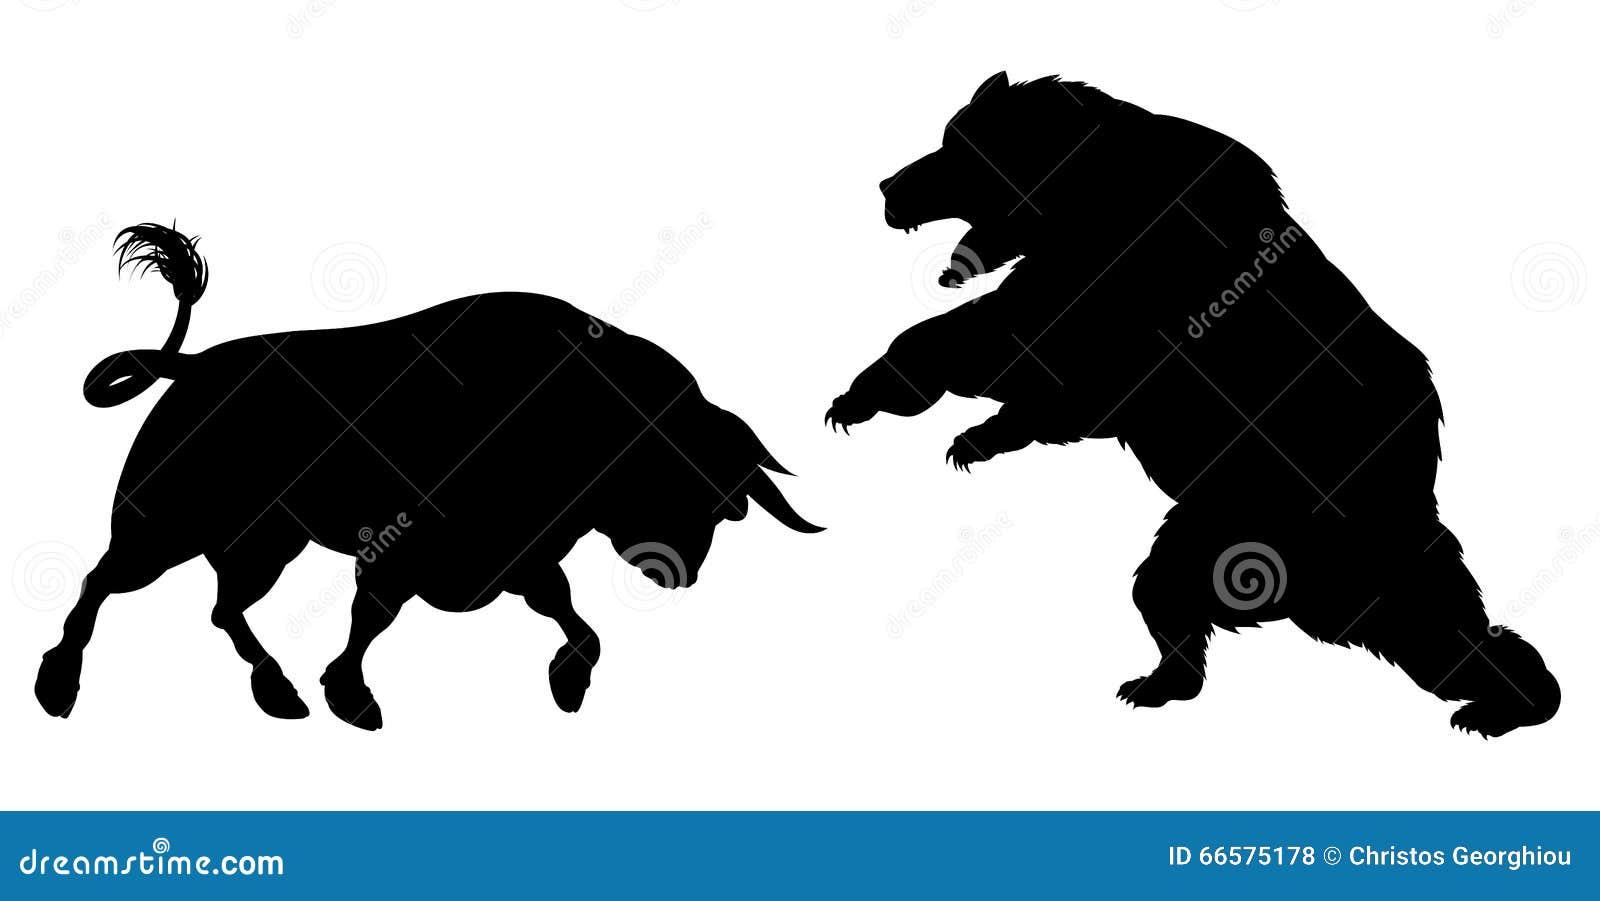 bear bull fighting stock illustrations – 157 bear bull fighting stock  illustrations, vectors & clipart - dreamstime  dreamstime.com